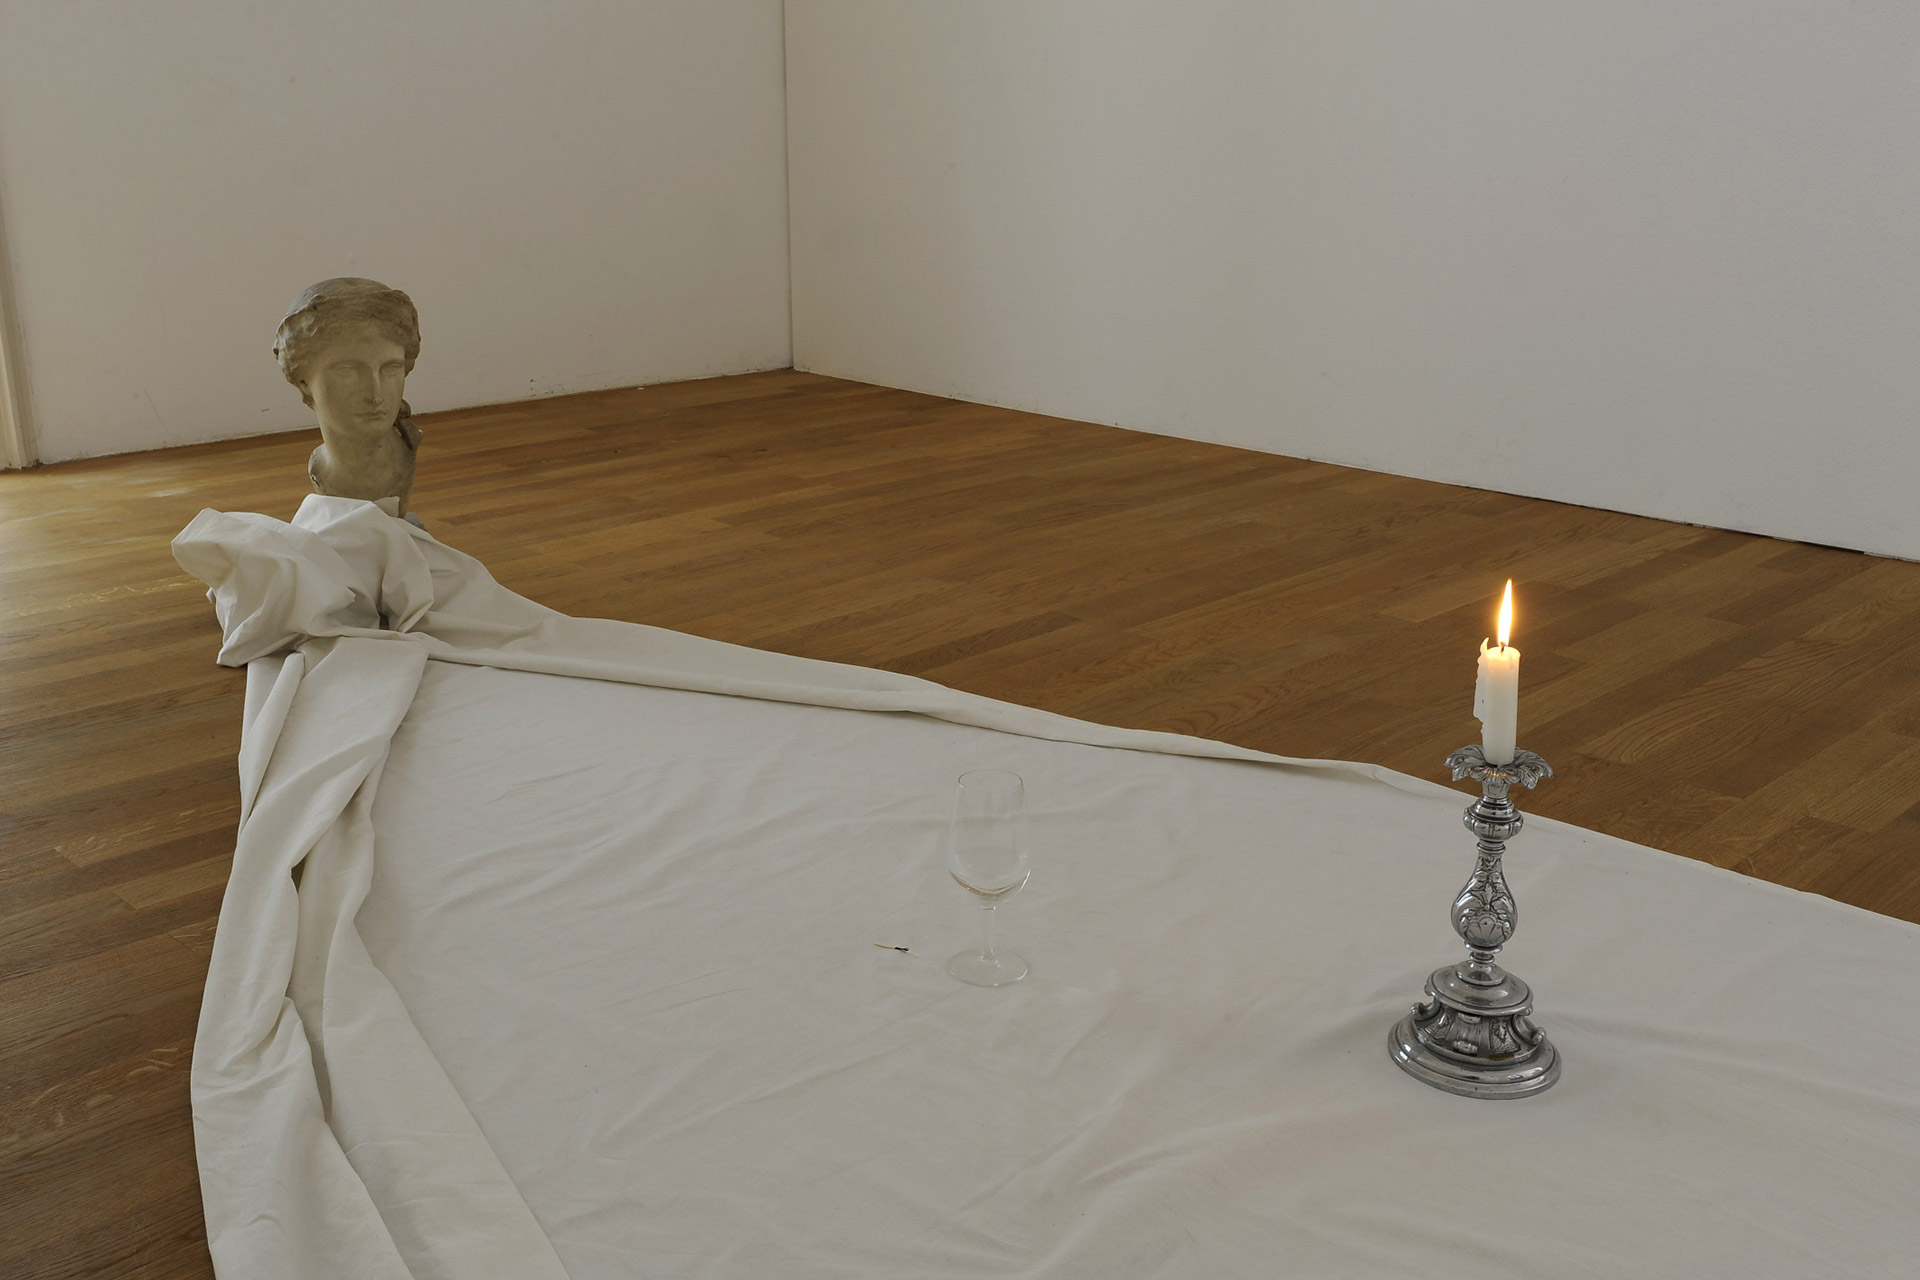 Martin-Soto-Climent-Kunsthalle-Winterthur-2012-4.jpg